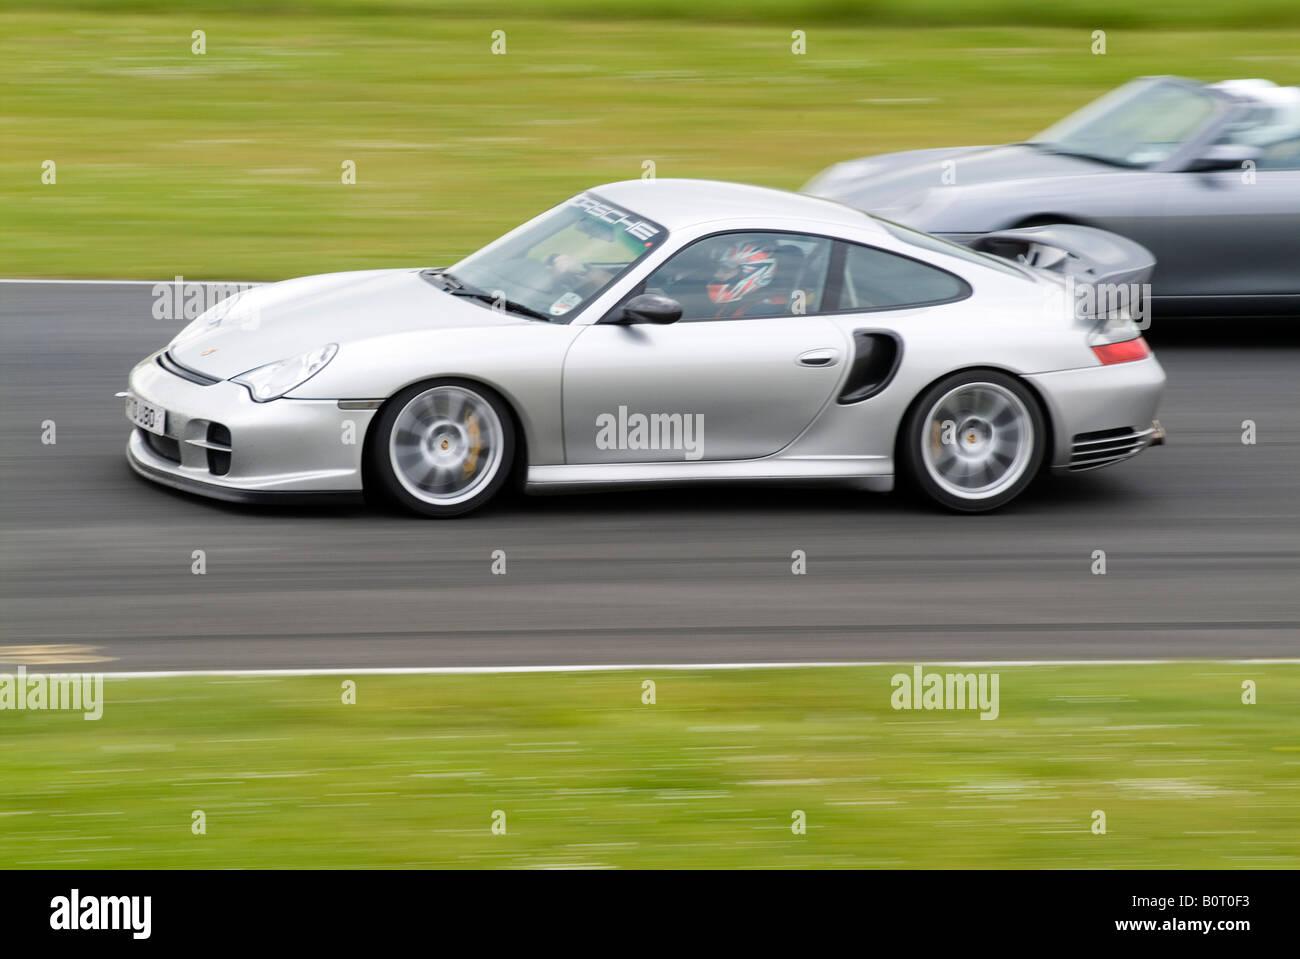 Porsche 911 996 Turbo Fast Car Super Track Day Trackday Circuit Road